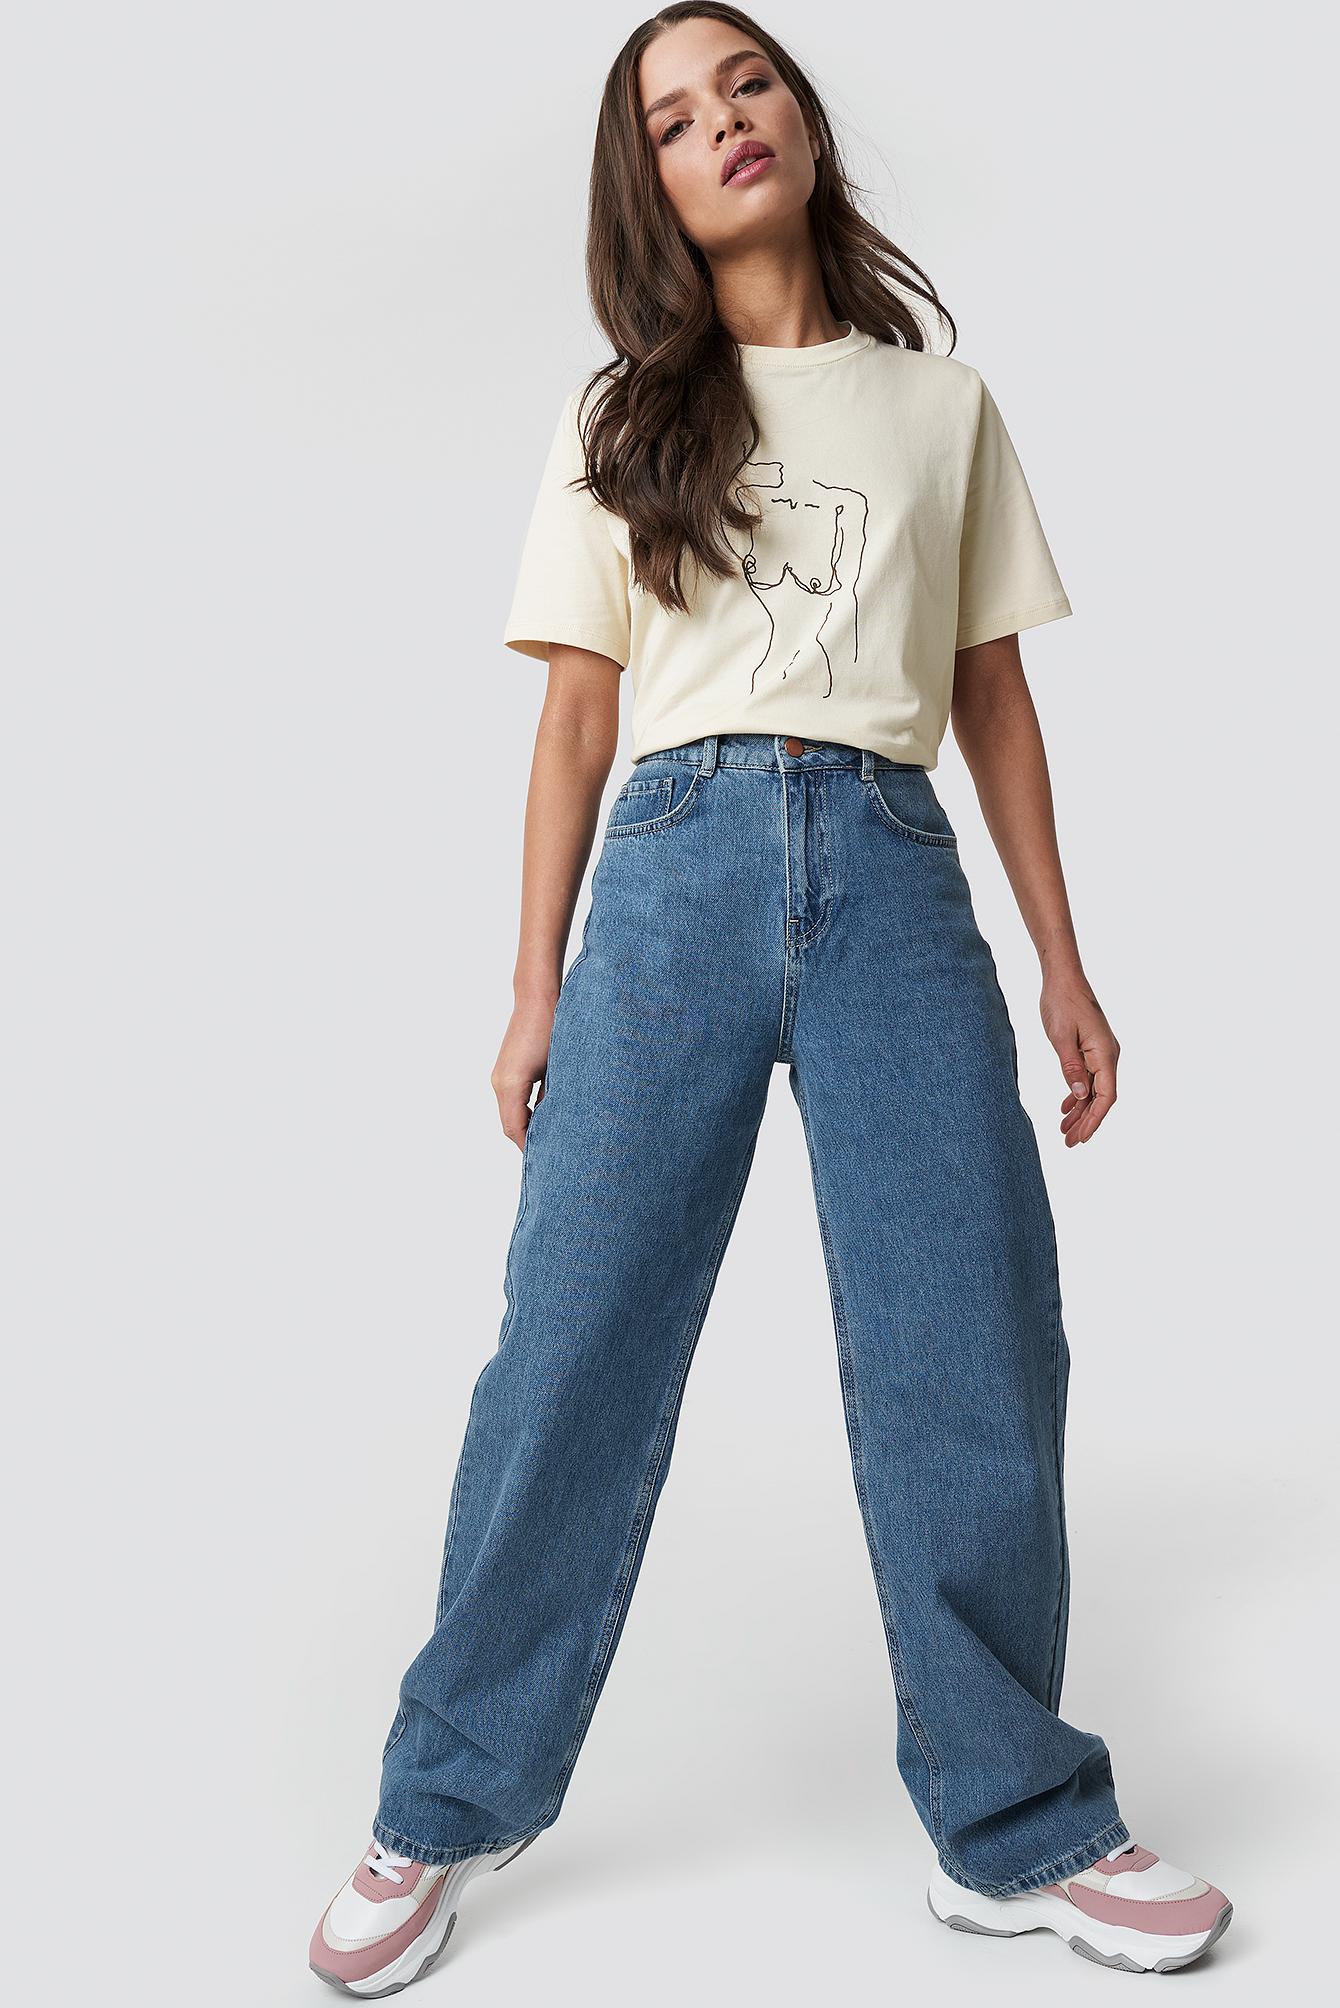 Lady Print T-shirt NA-KD.COM